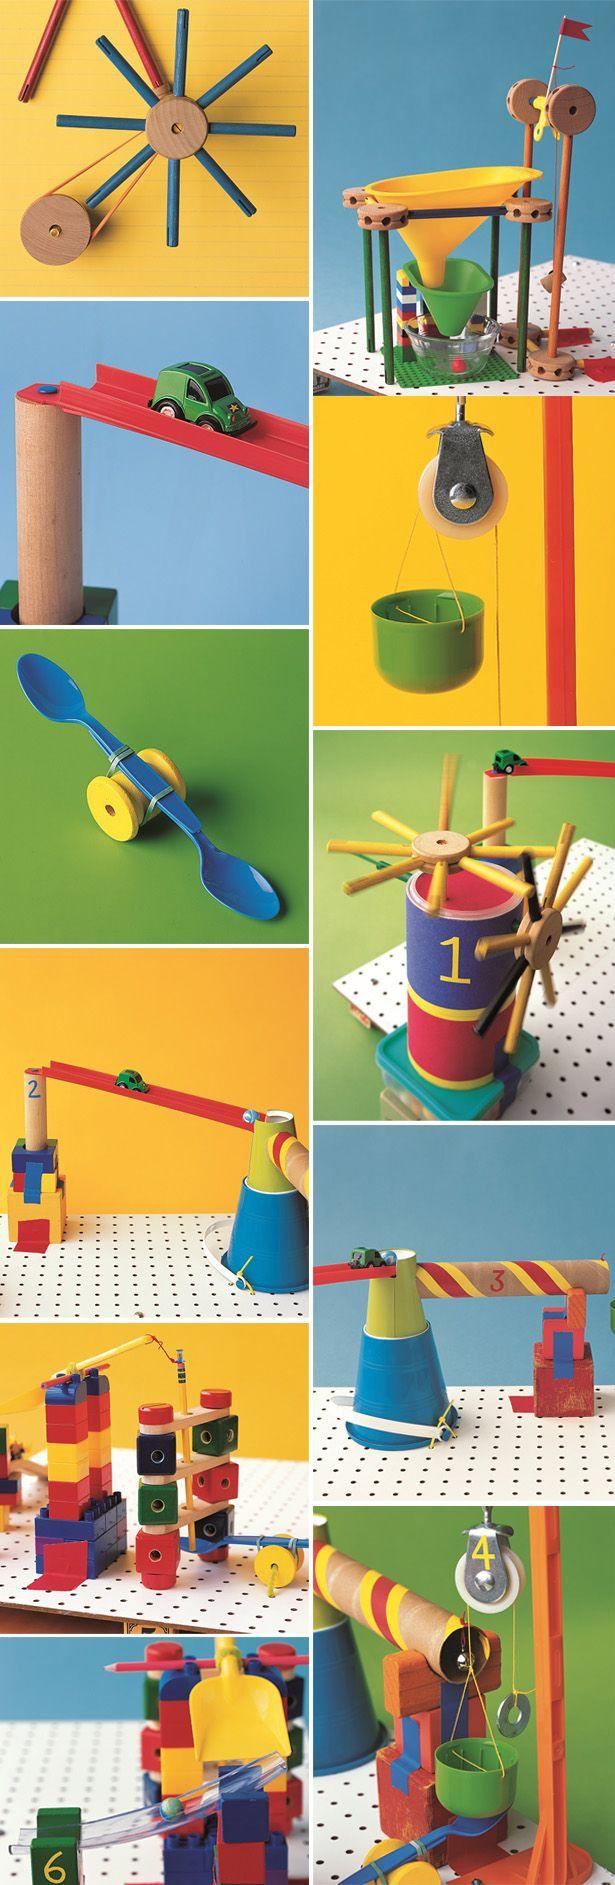 DIY marble run craft + book giveaway | homeschool | Pinterest ...